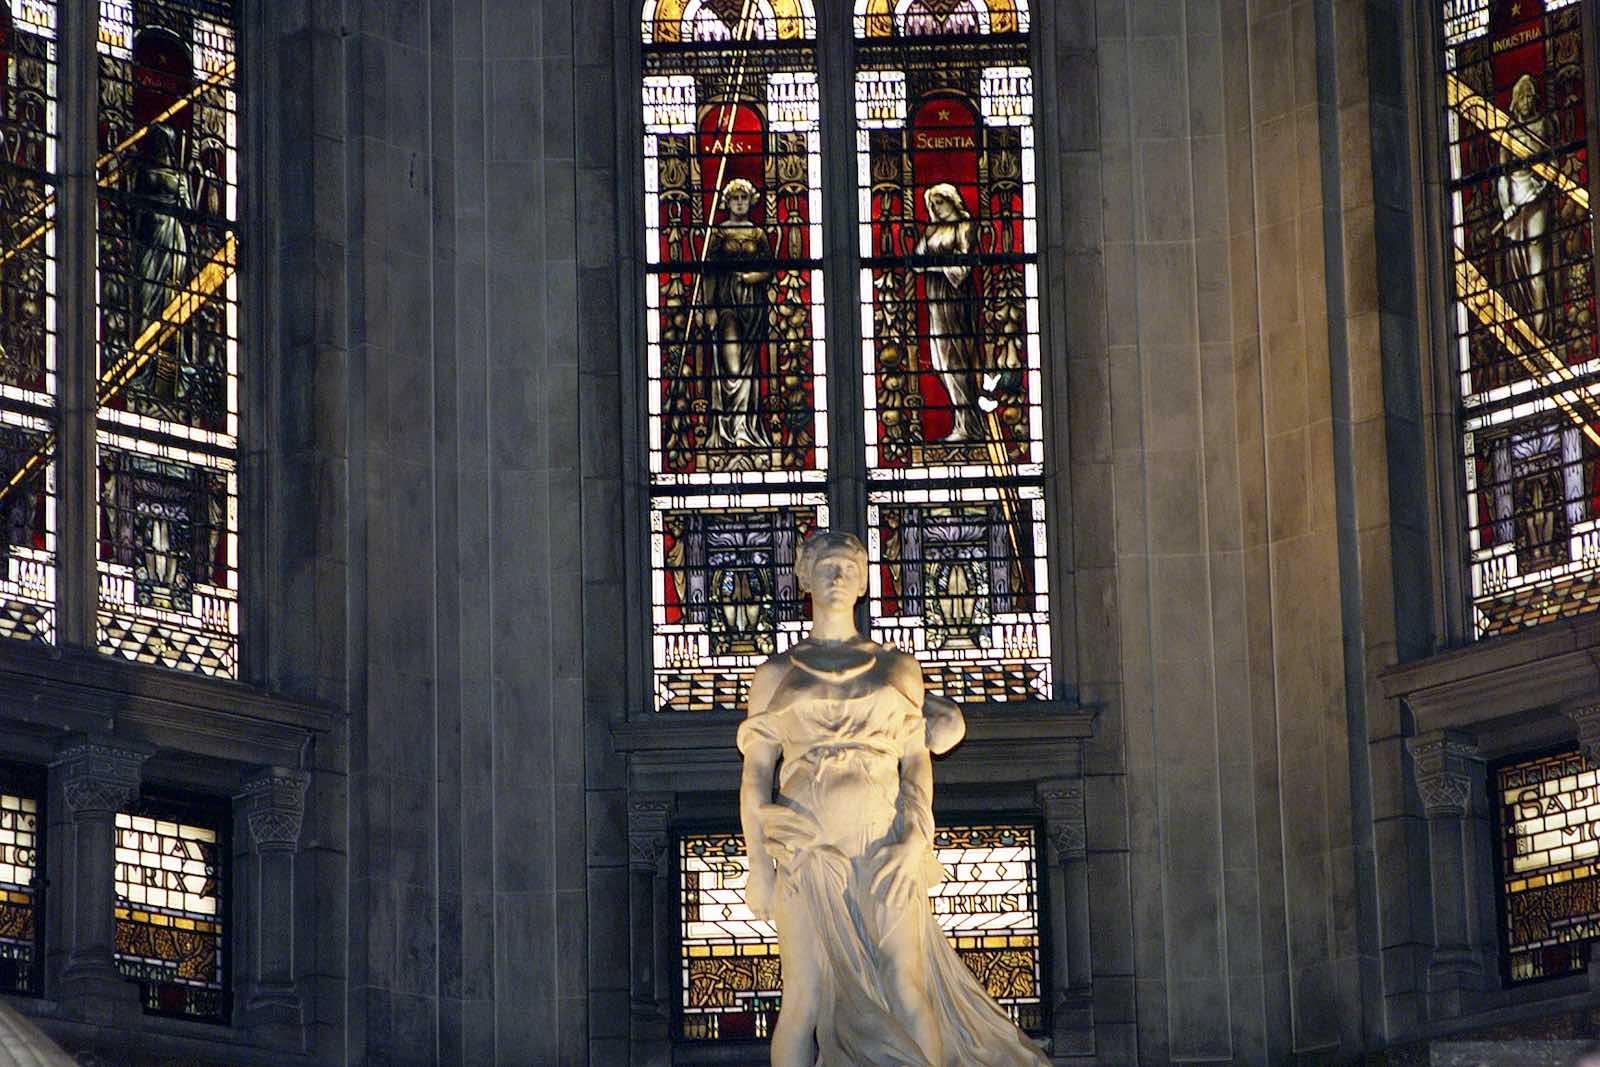 Interior of the Peace Palace, The Hague (Photo: Evan Schneider/UN)